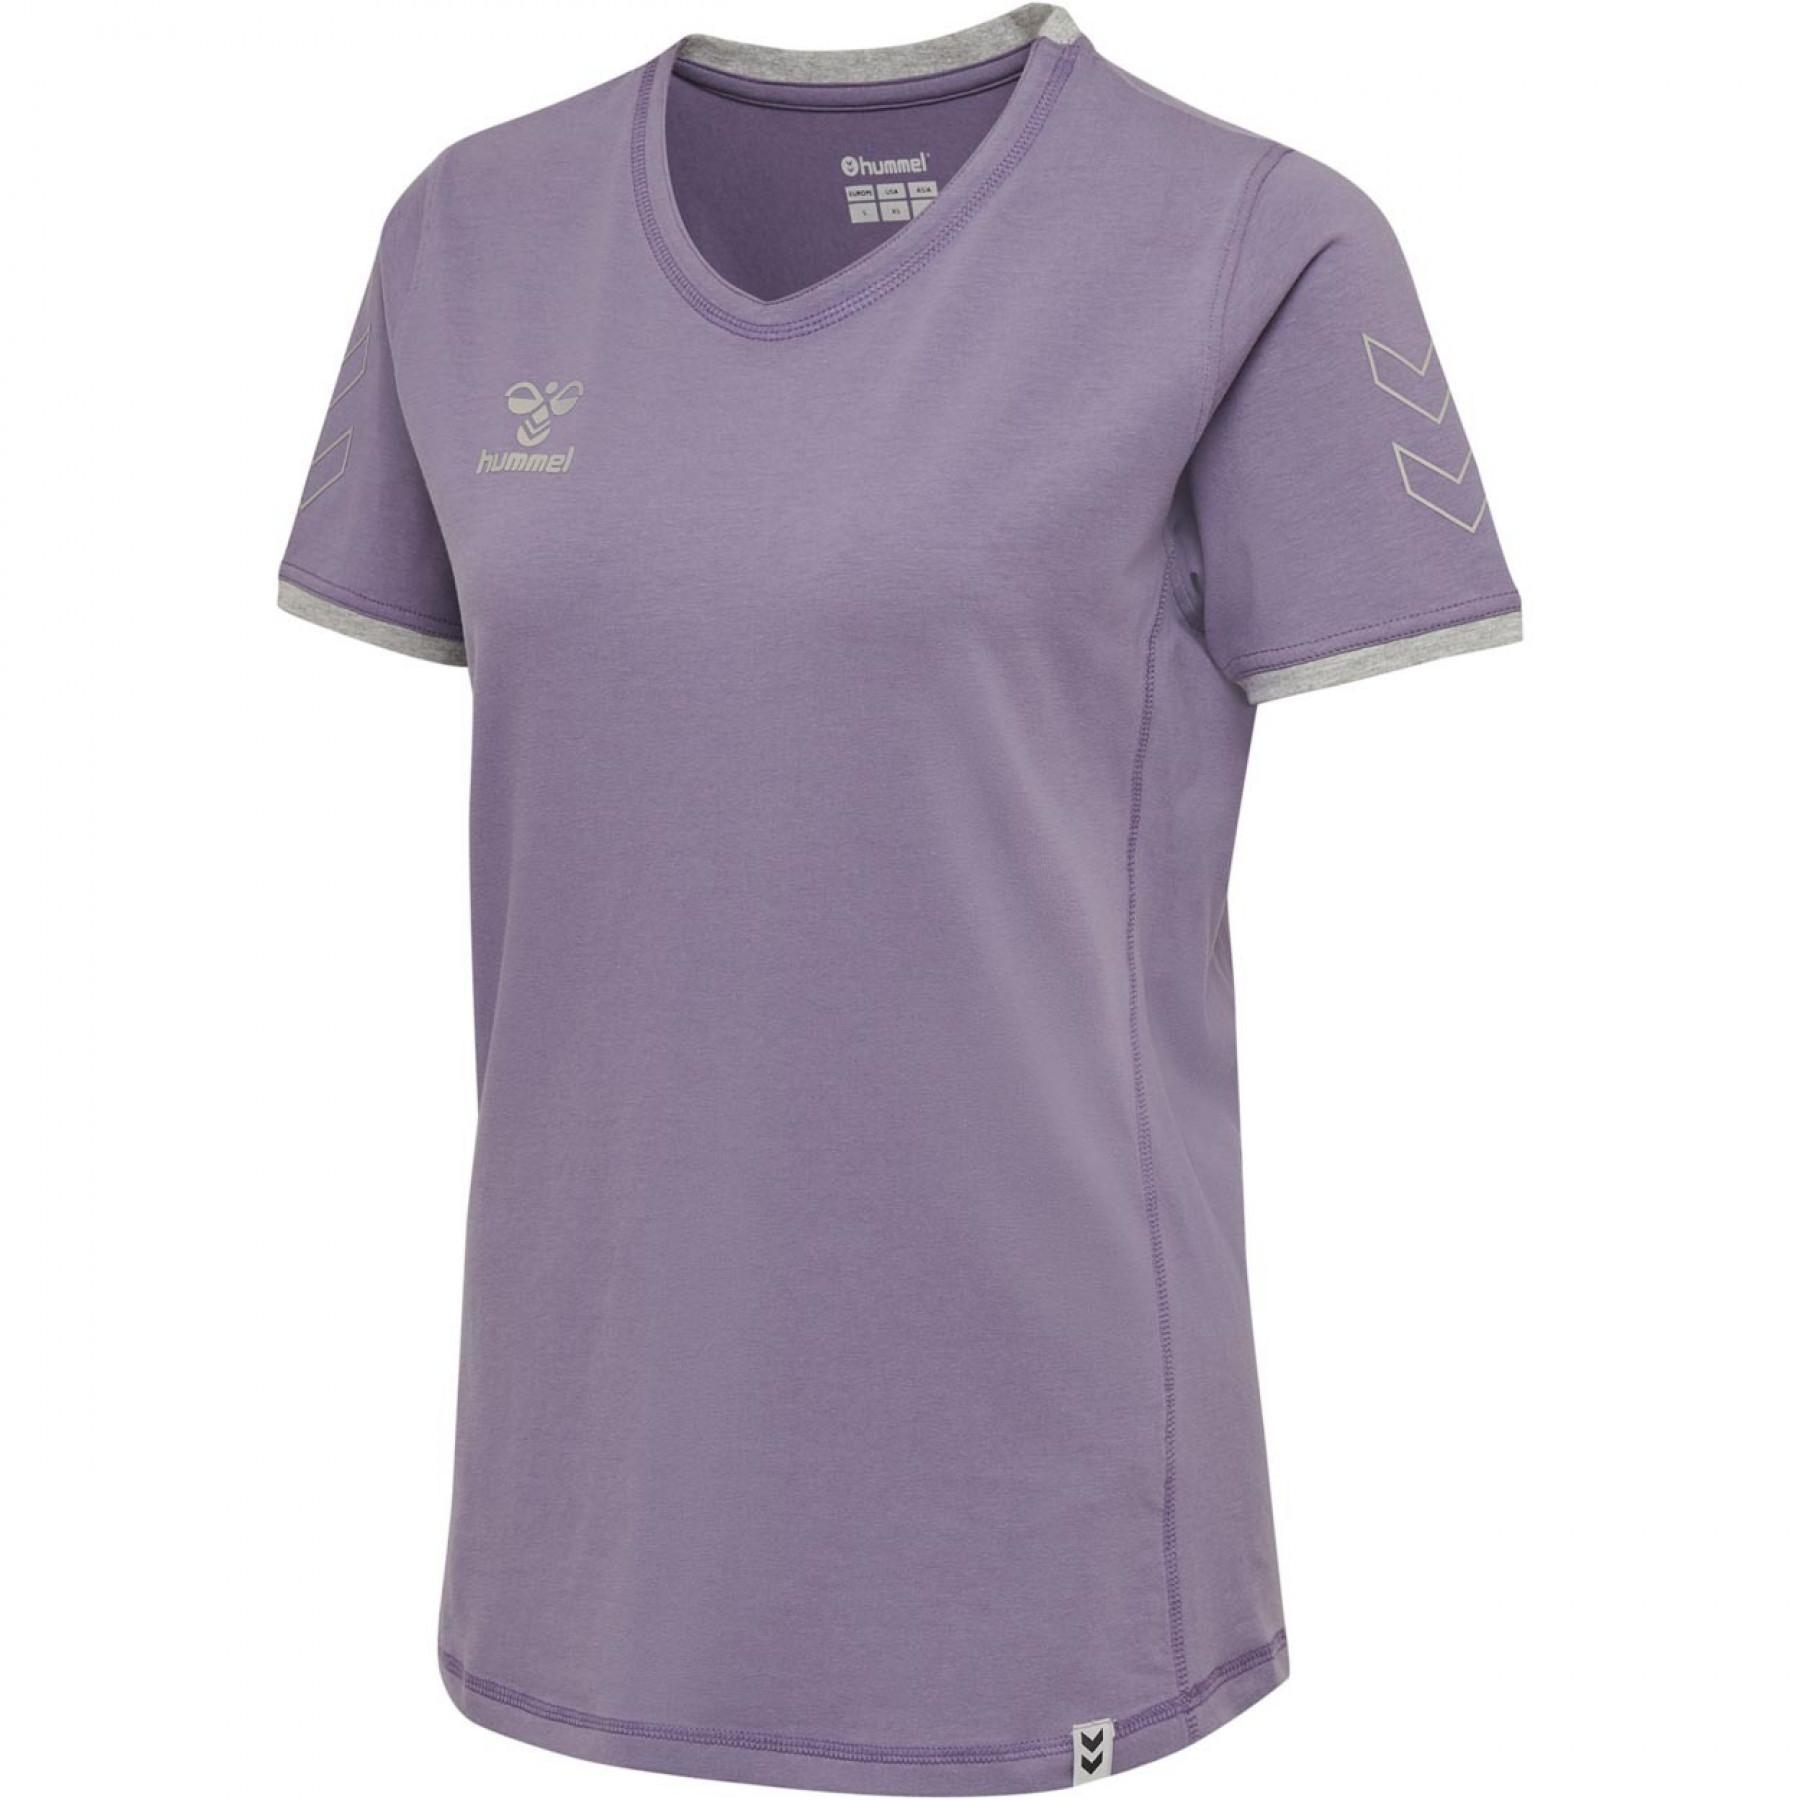 T-Shirt Hummel Cima